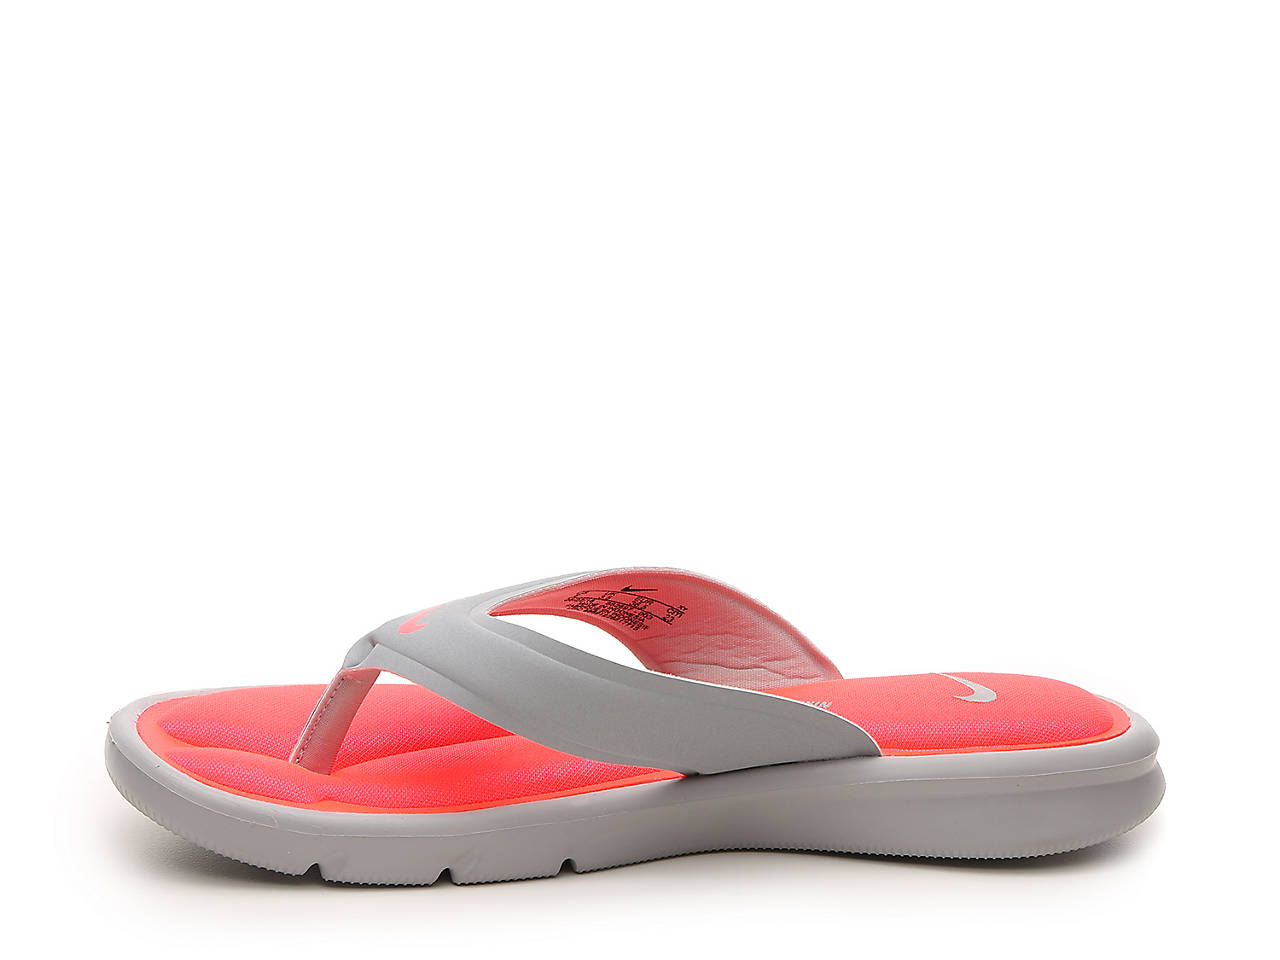 8d58edf8182aa Nike Ultra Comfort Sandal Women s Shoes